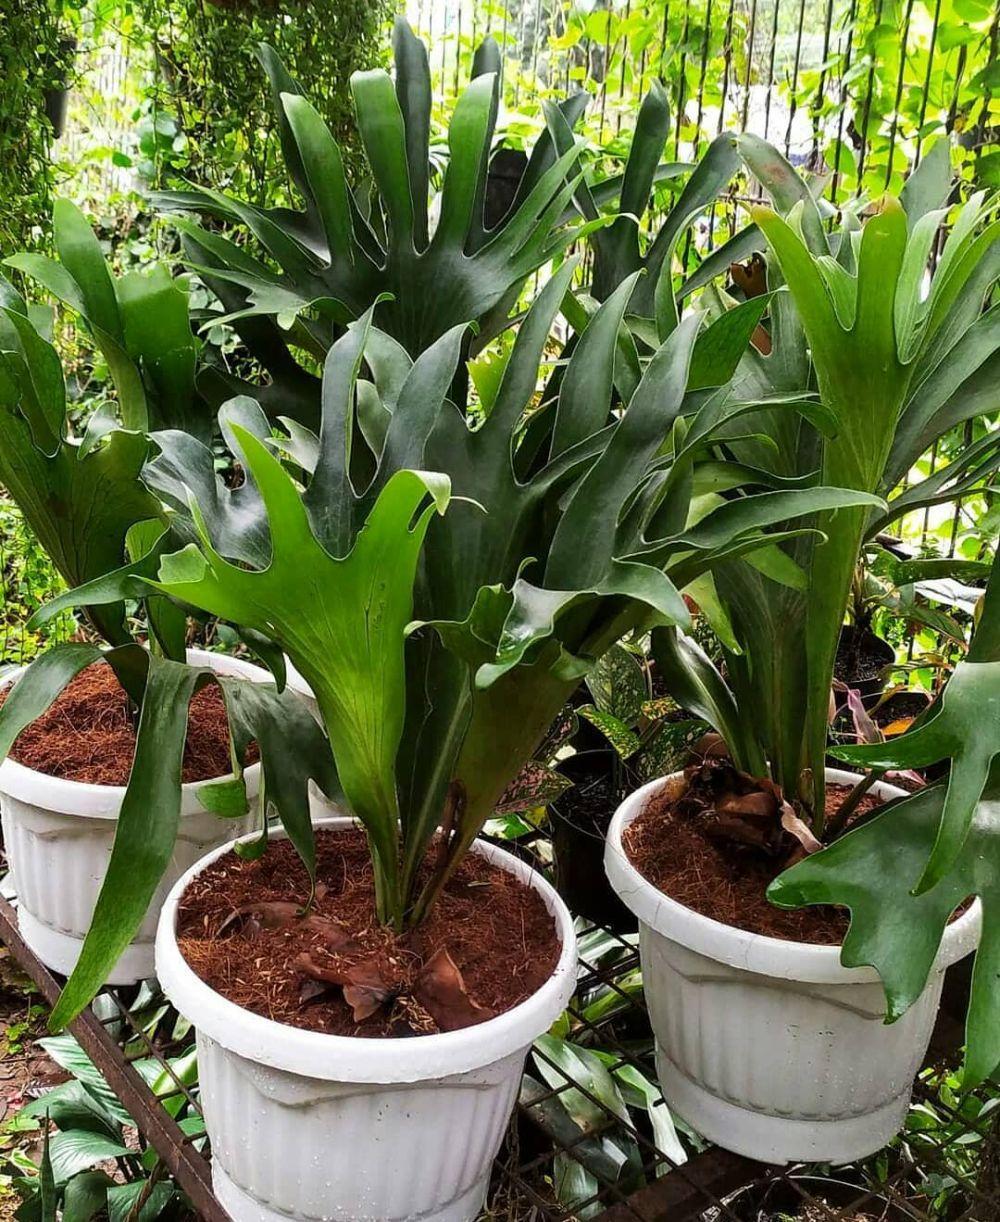 Cara merawat tanaman hias gantung pakis instagram ; freepik © 2021 brilio.net